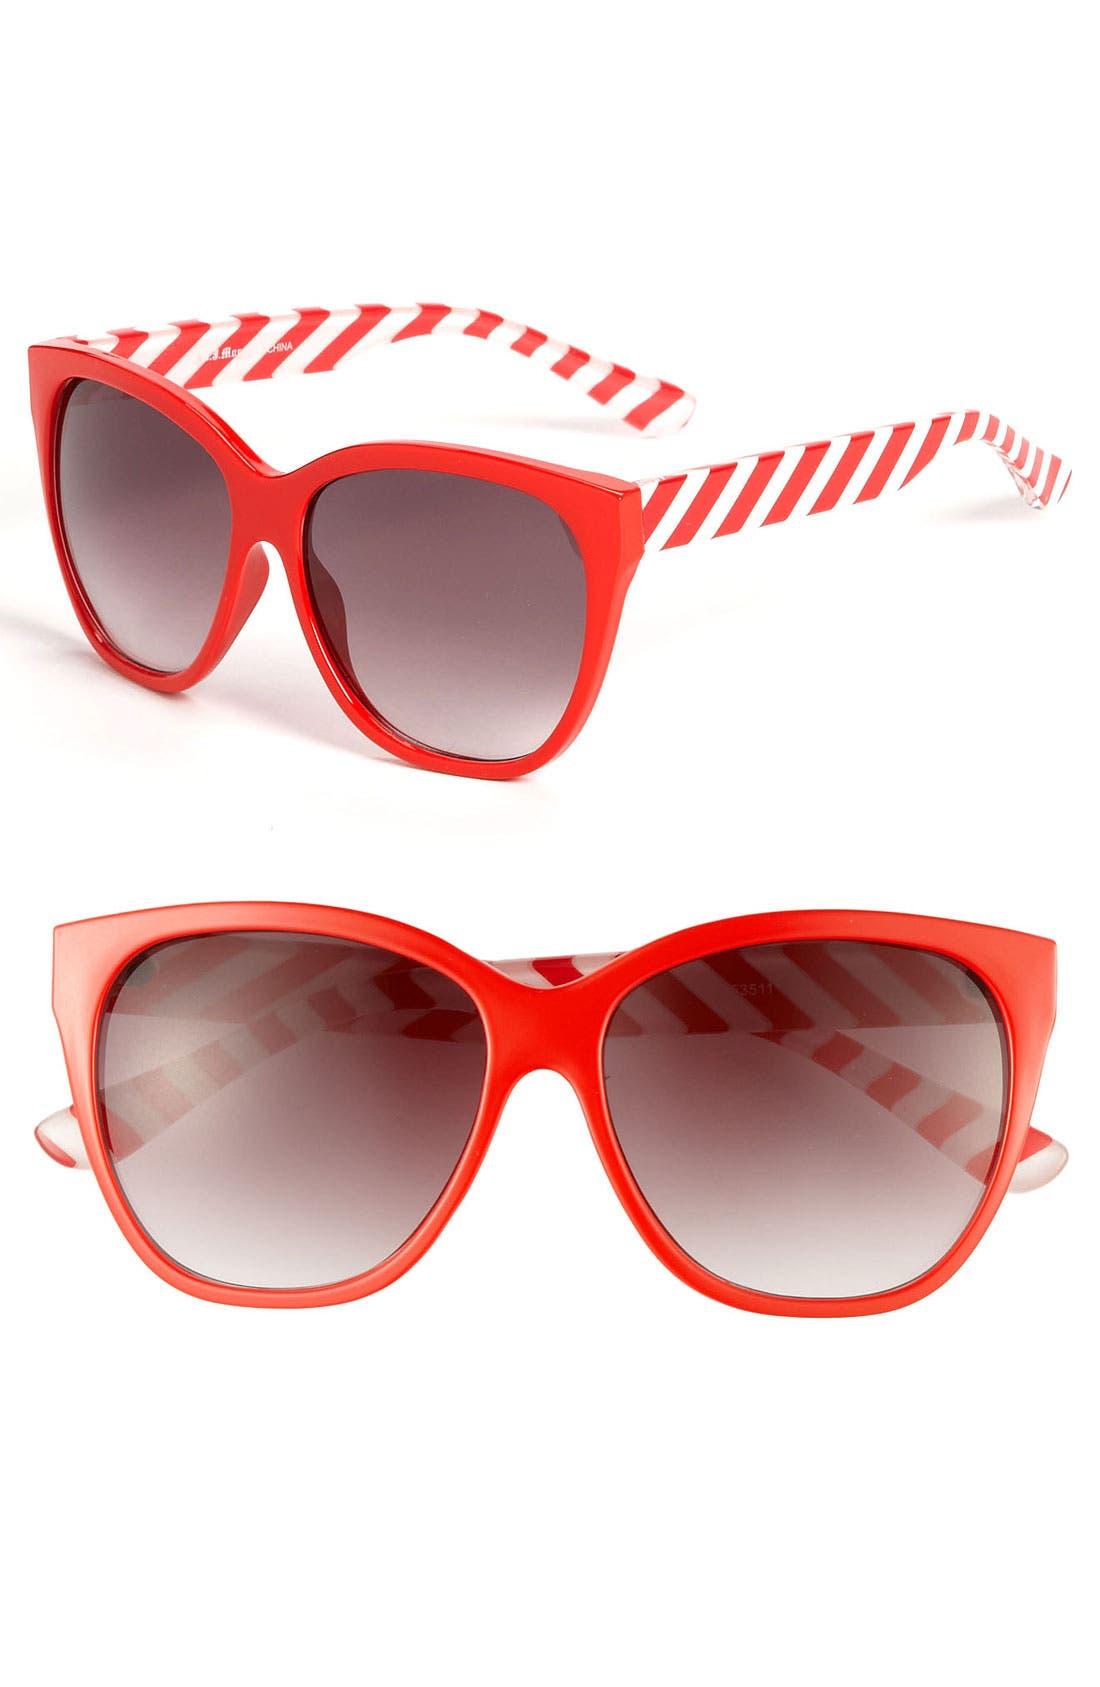 Alternate Image 1 Selected - A.J. Morgan 'Cha Cha' Sunglasses